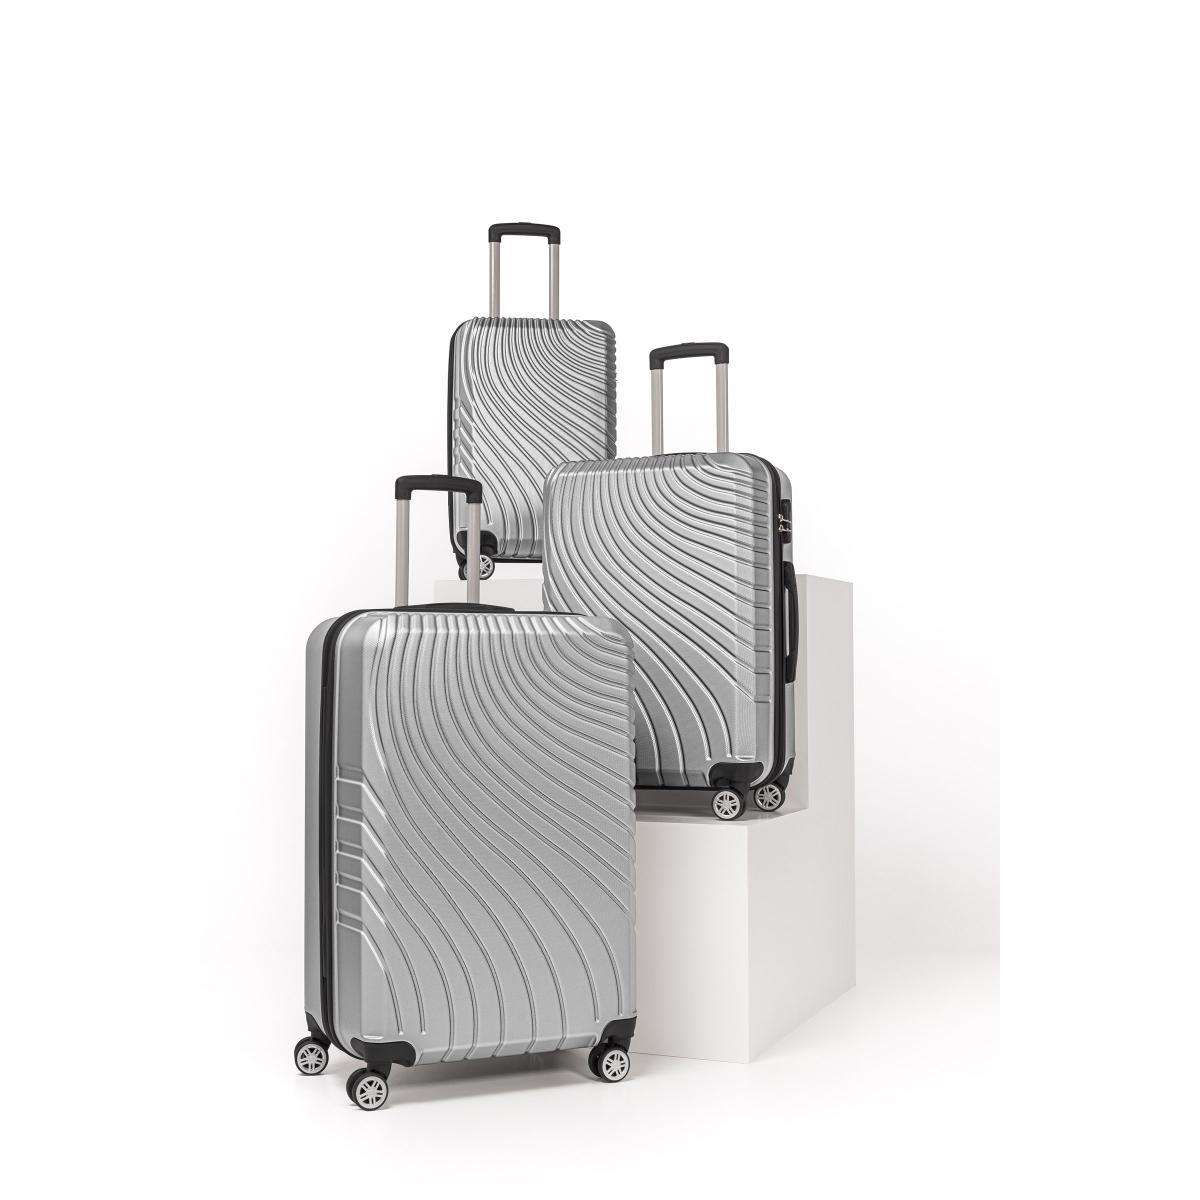 Gedox Abs 3'lü Valiz Seyahat Seti - Model:700.03 Gri